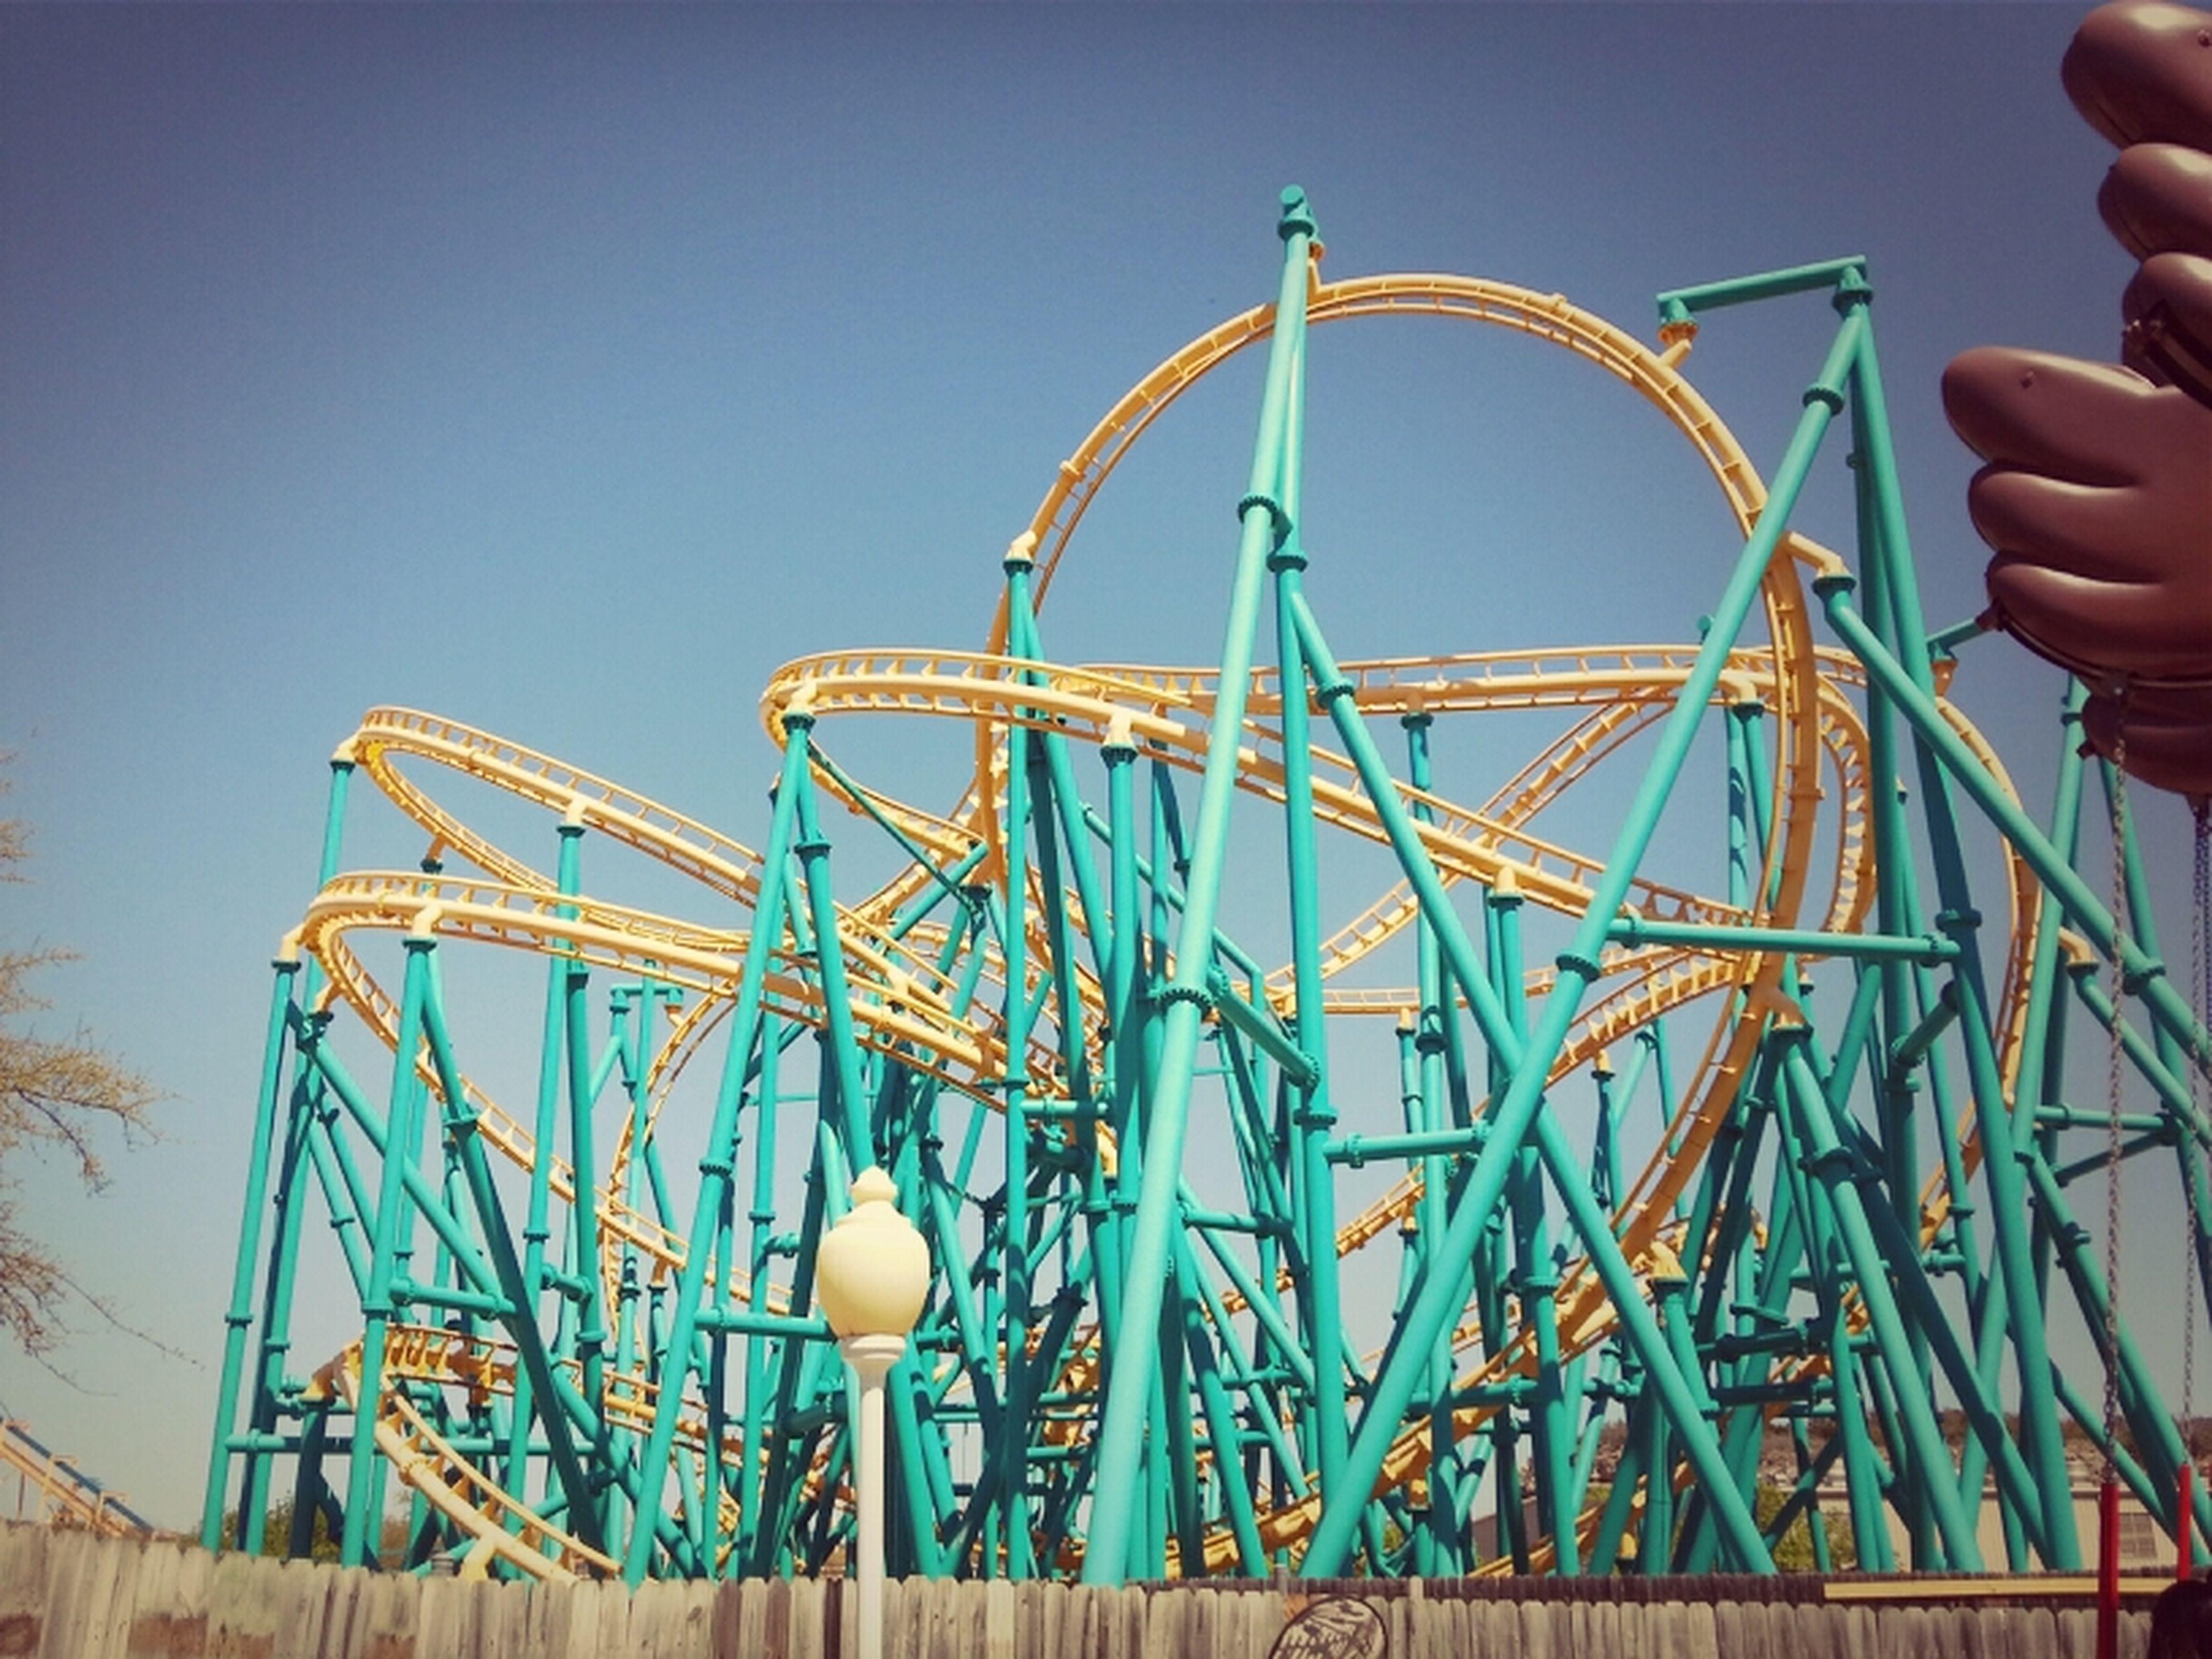 clear sky, low angle view, amusement park, blue, metal, amusement park ride, arts culture and entertainment, sky, ferris wheel, part of, cropped, copy space, leisure activity, built structure, metallic, outdoors, day, person